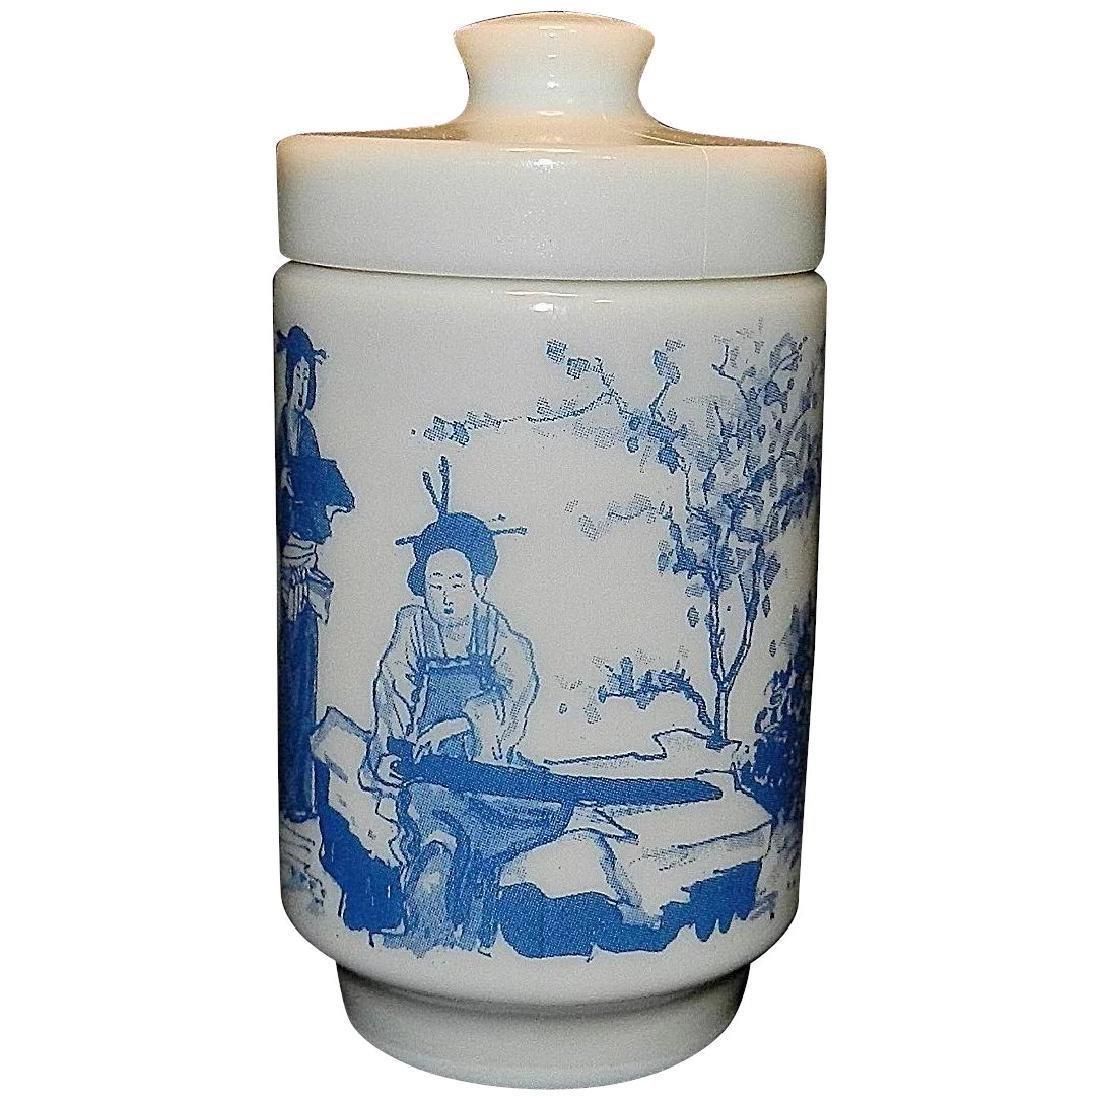 Vintage Milk Glass Apothecary Jar with Oriental Scene